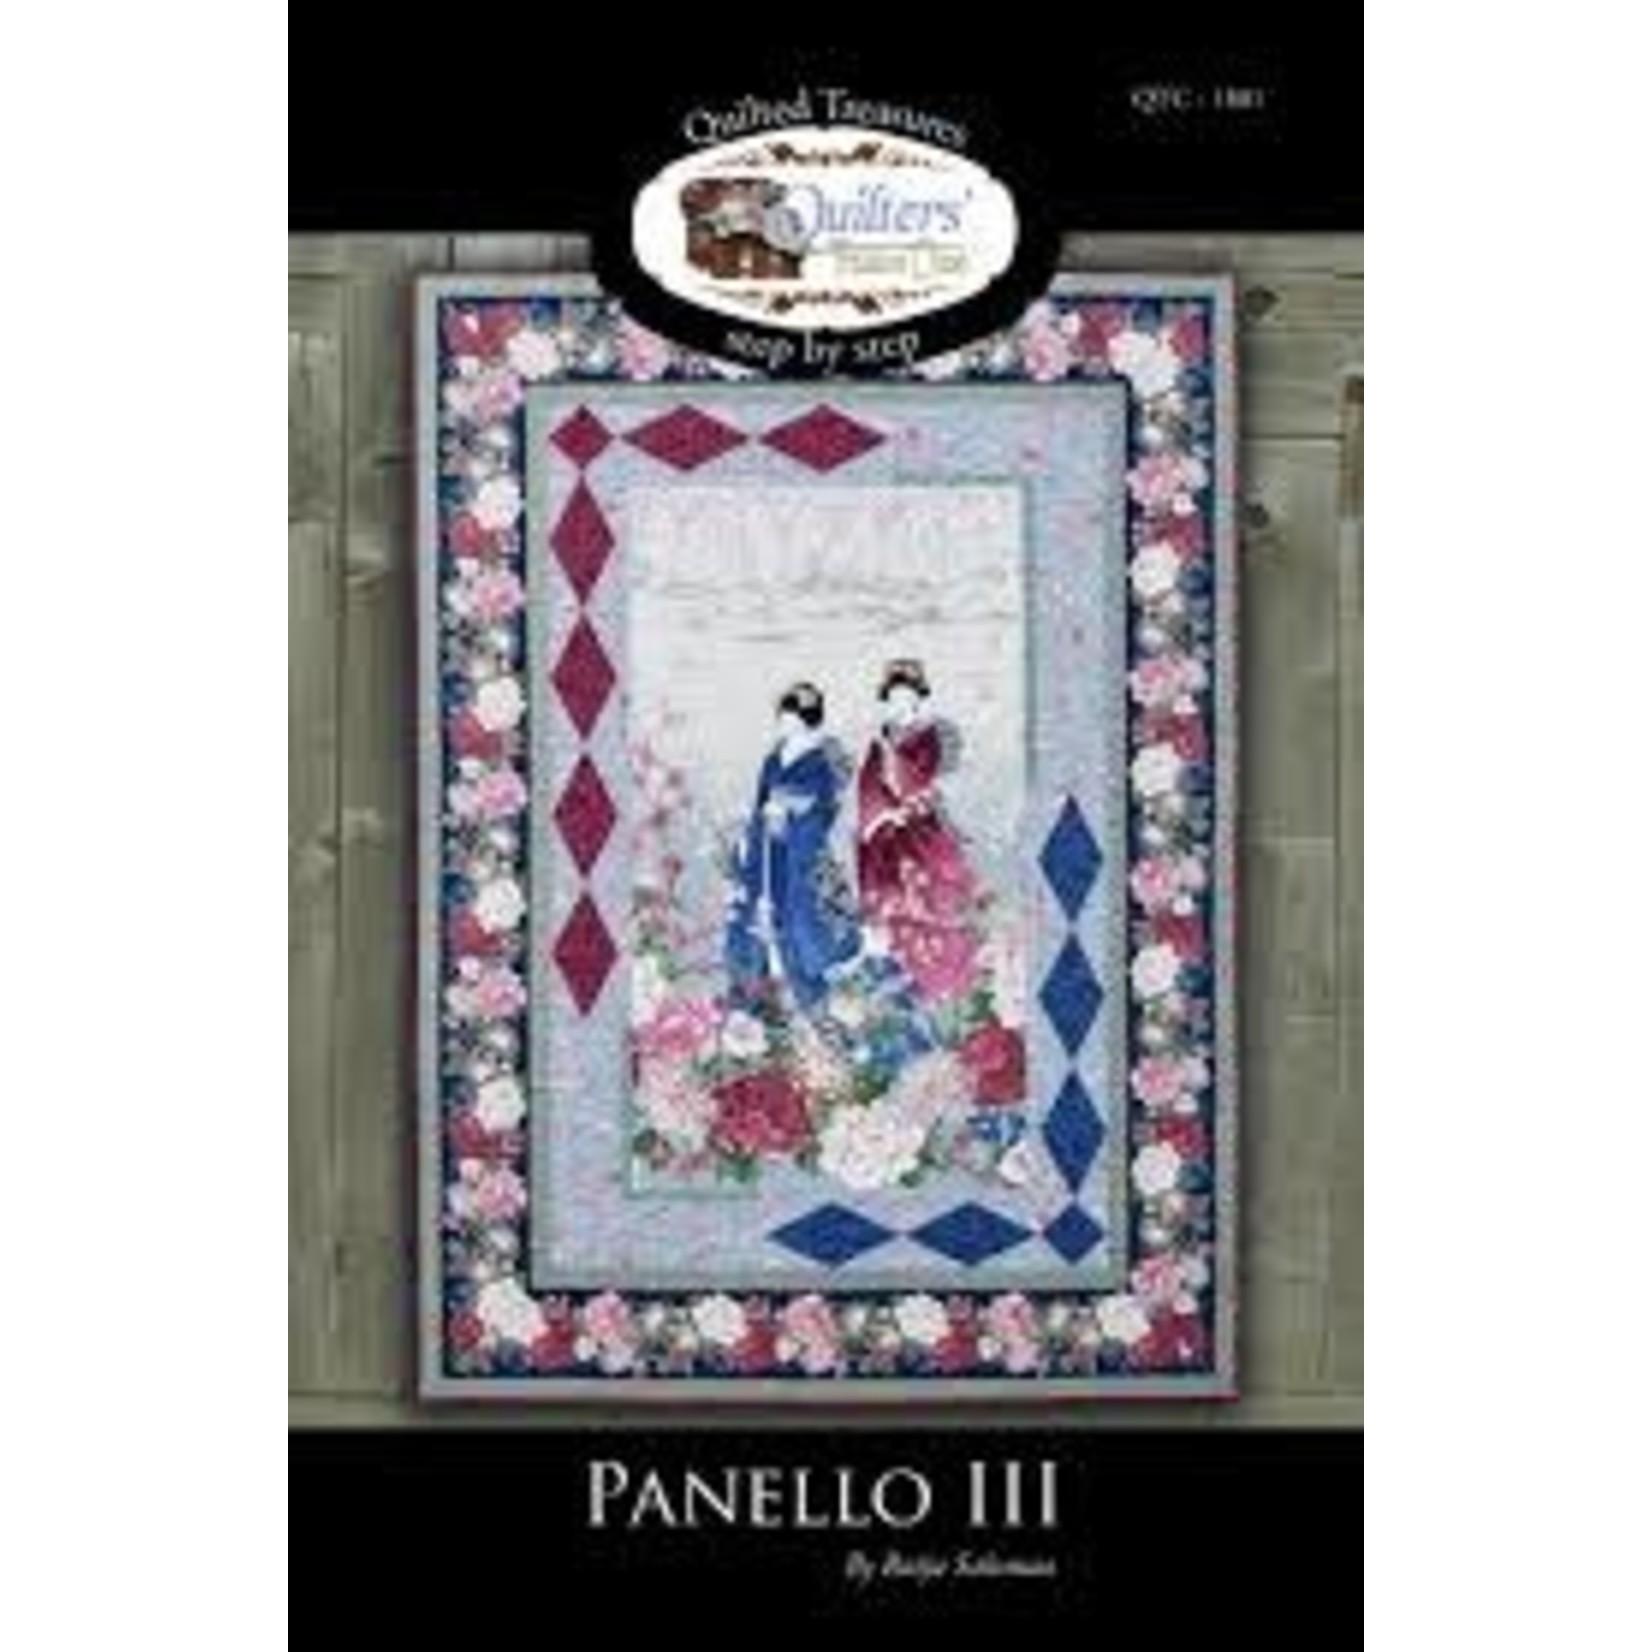 Quilting Treasures Panello III Quilt Pattern